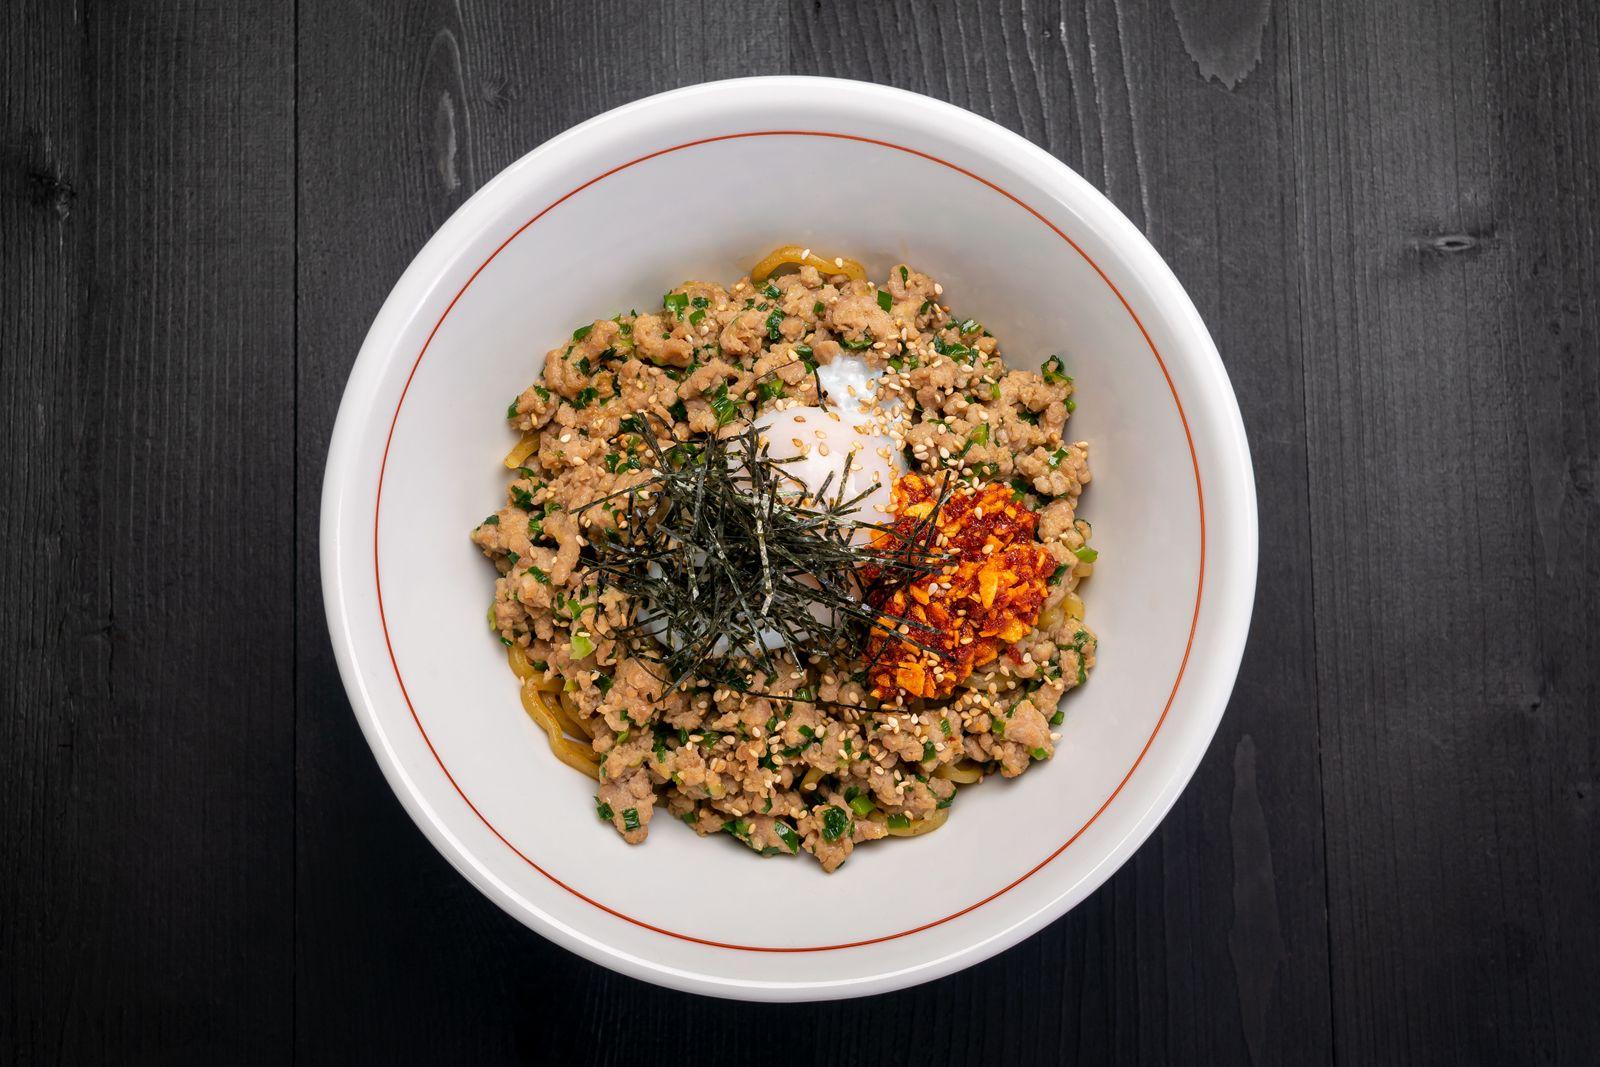 JINYA Ramen Bar Launches Bold New Vegan and Vegetarian Dishes